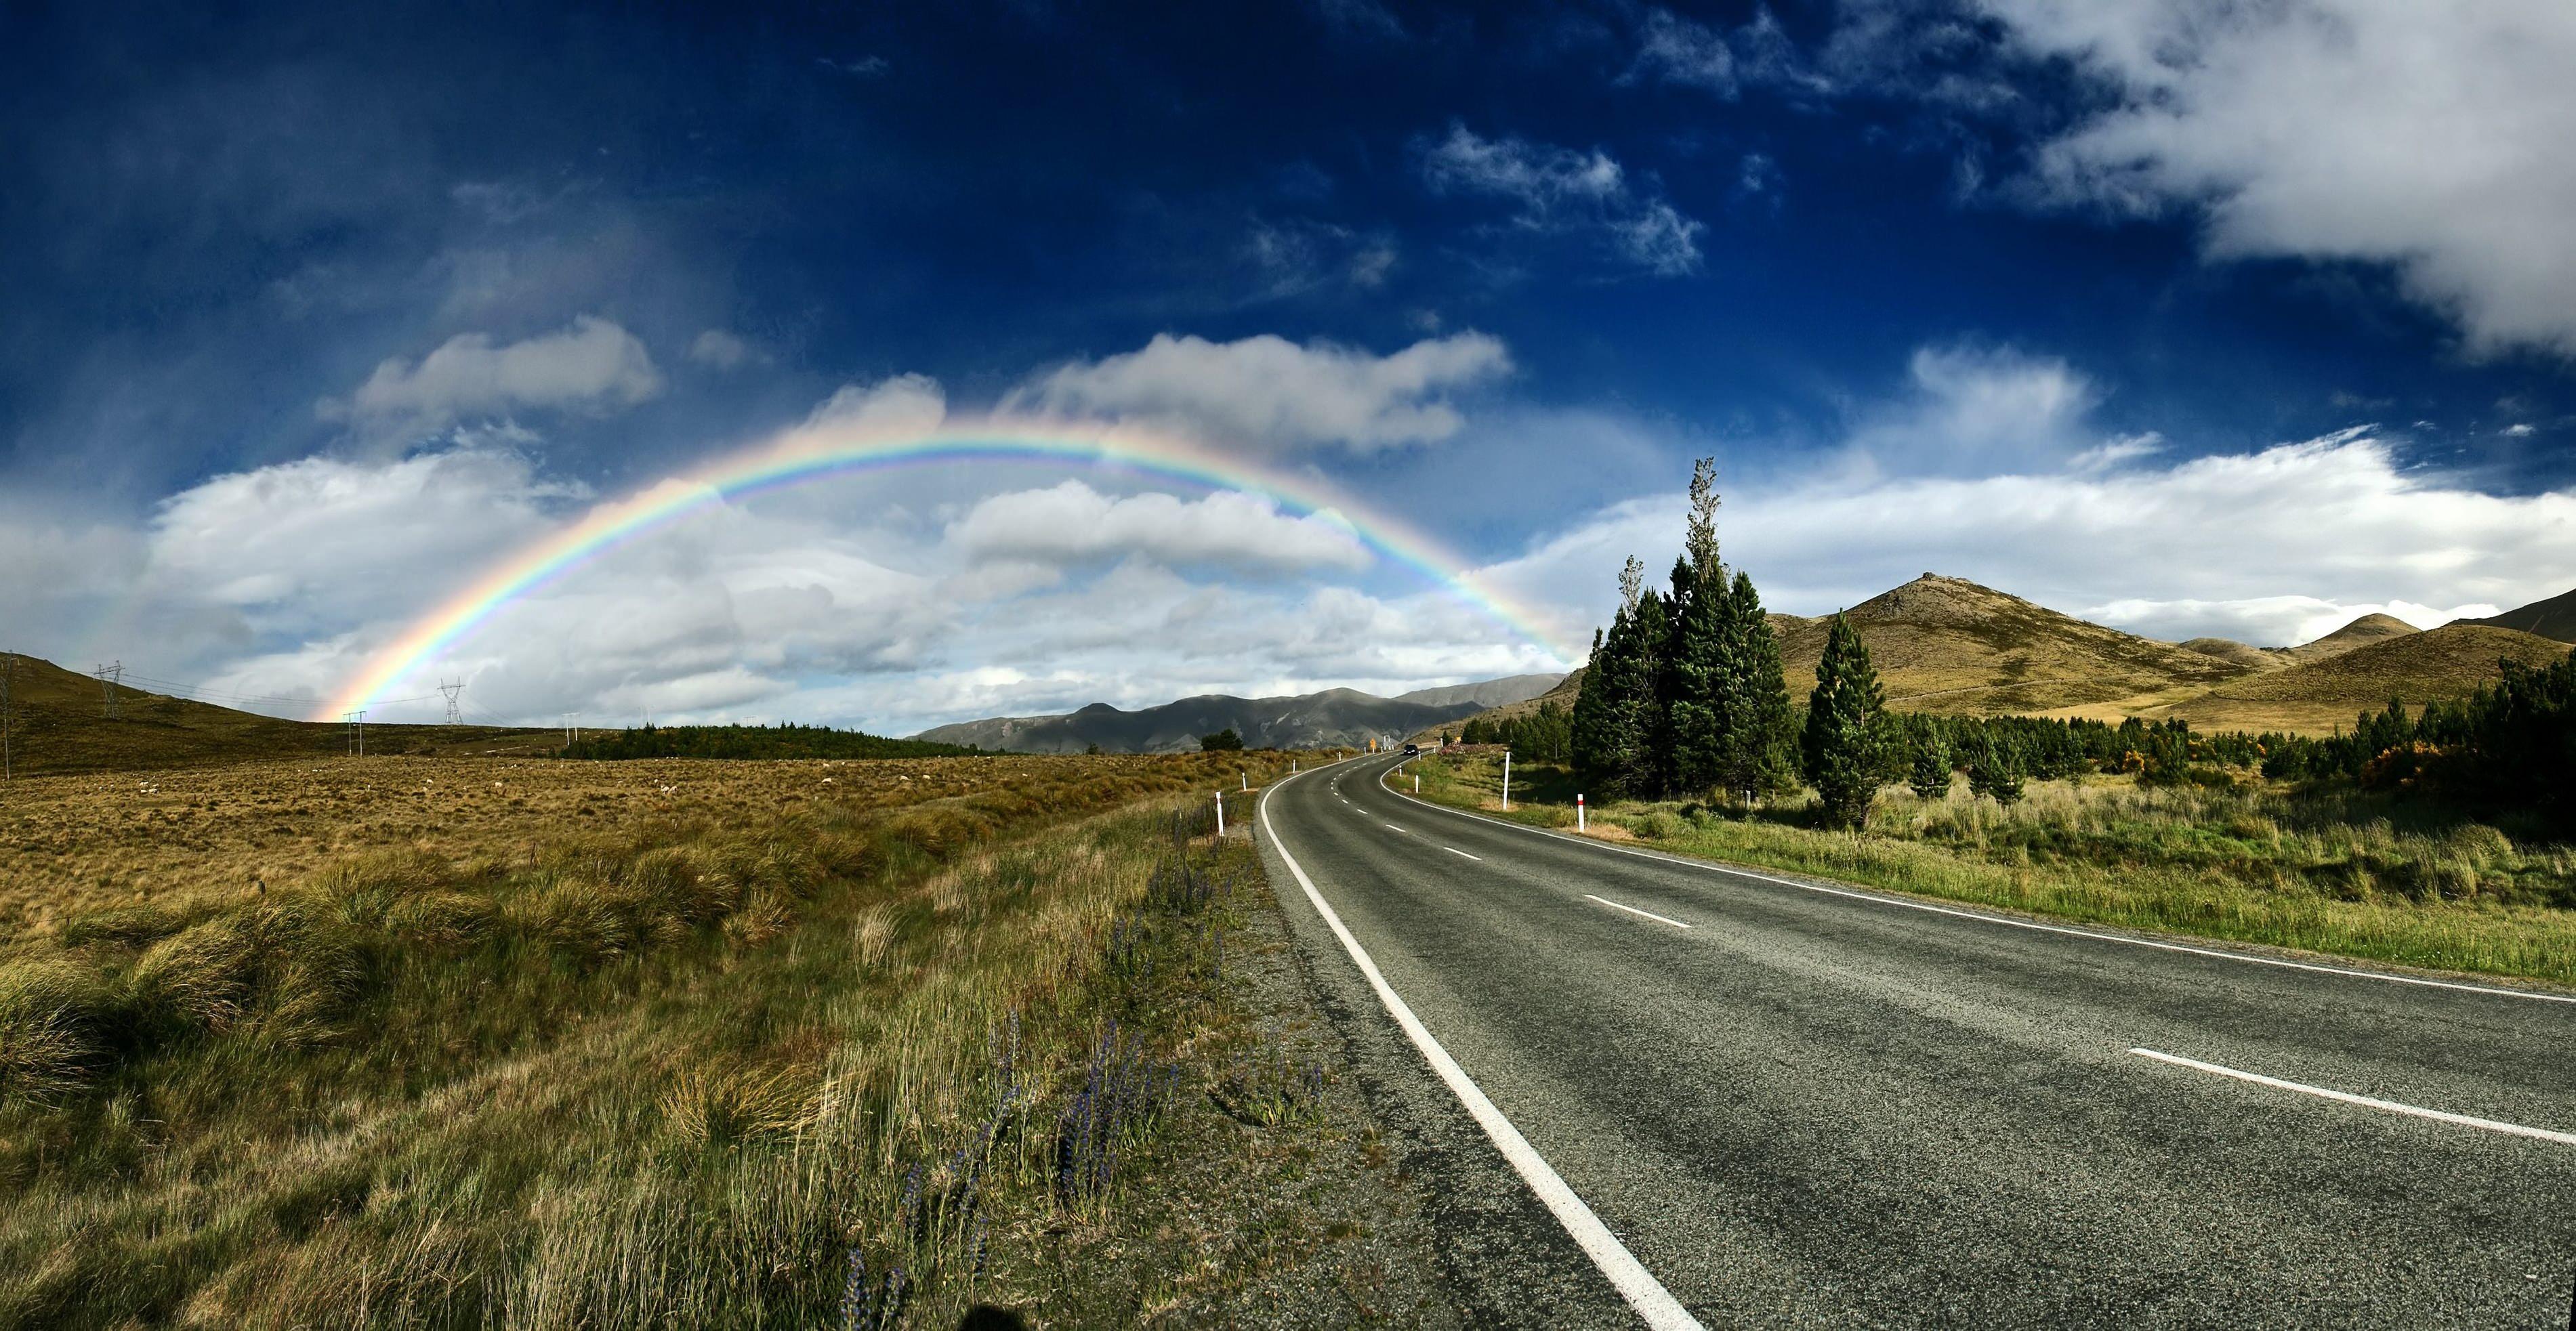 highway near trees and rainbow under blue sky